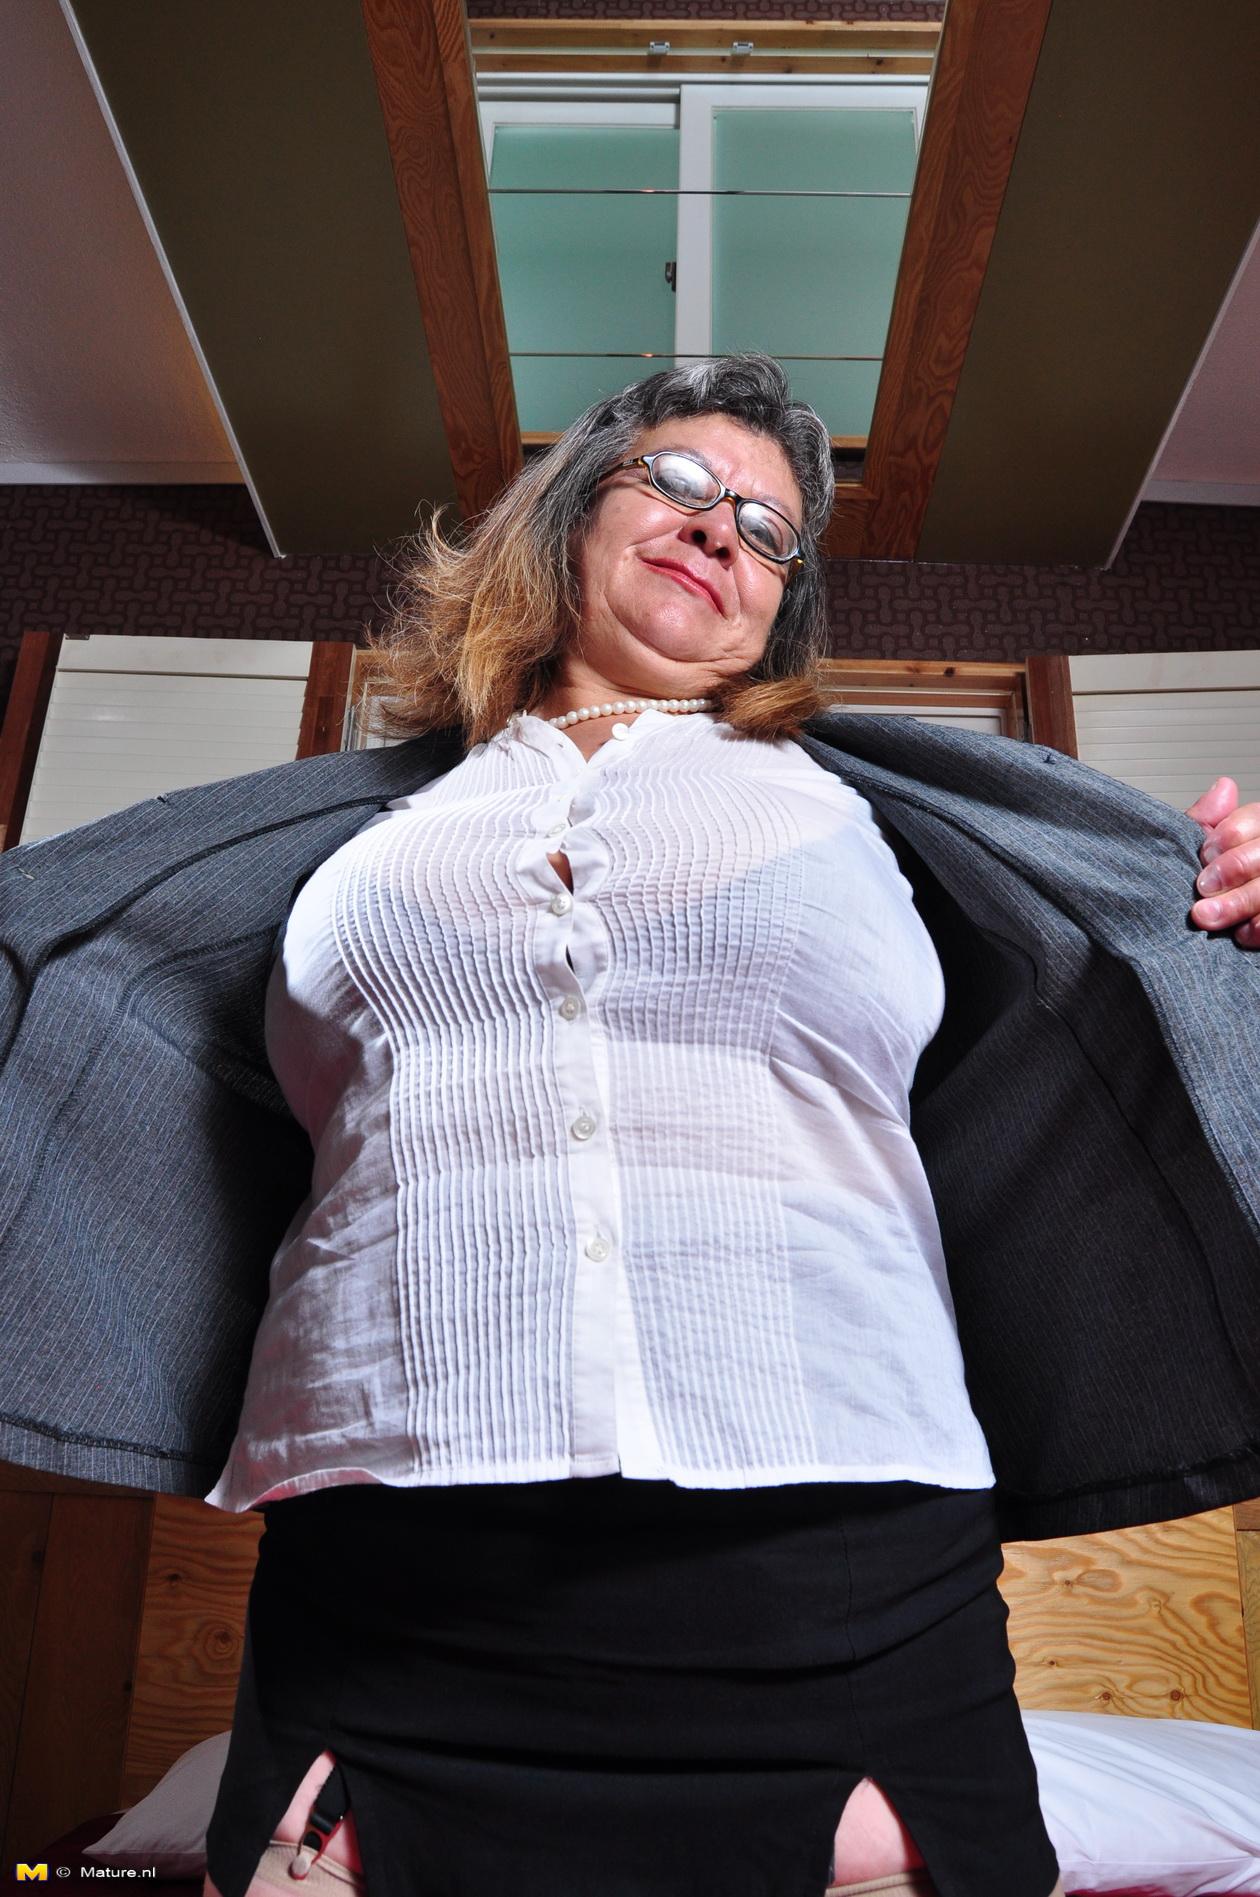 Jeanette biedermann naked guatemala sluts trachtenberg xxx full